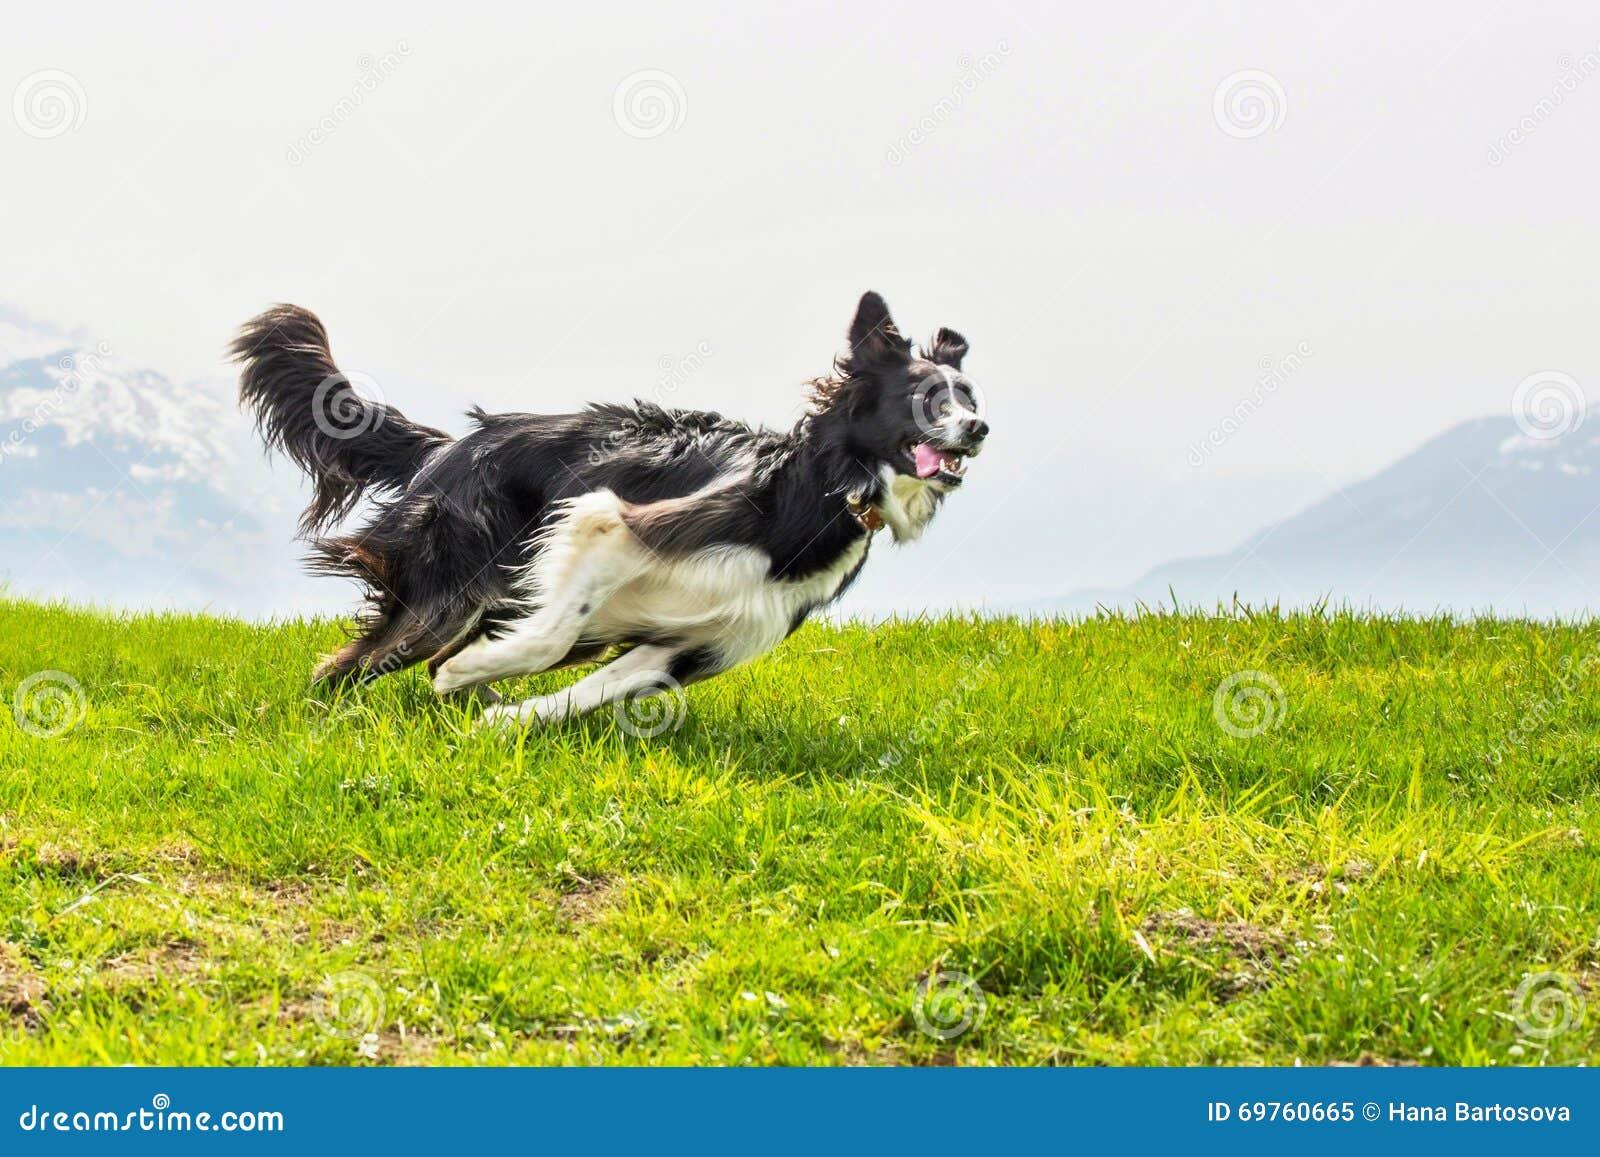 Running quick and elegant dog border collie